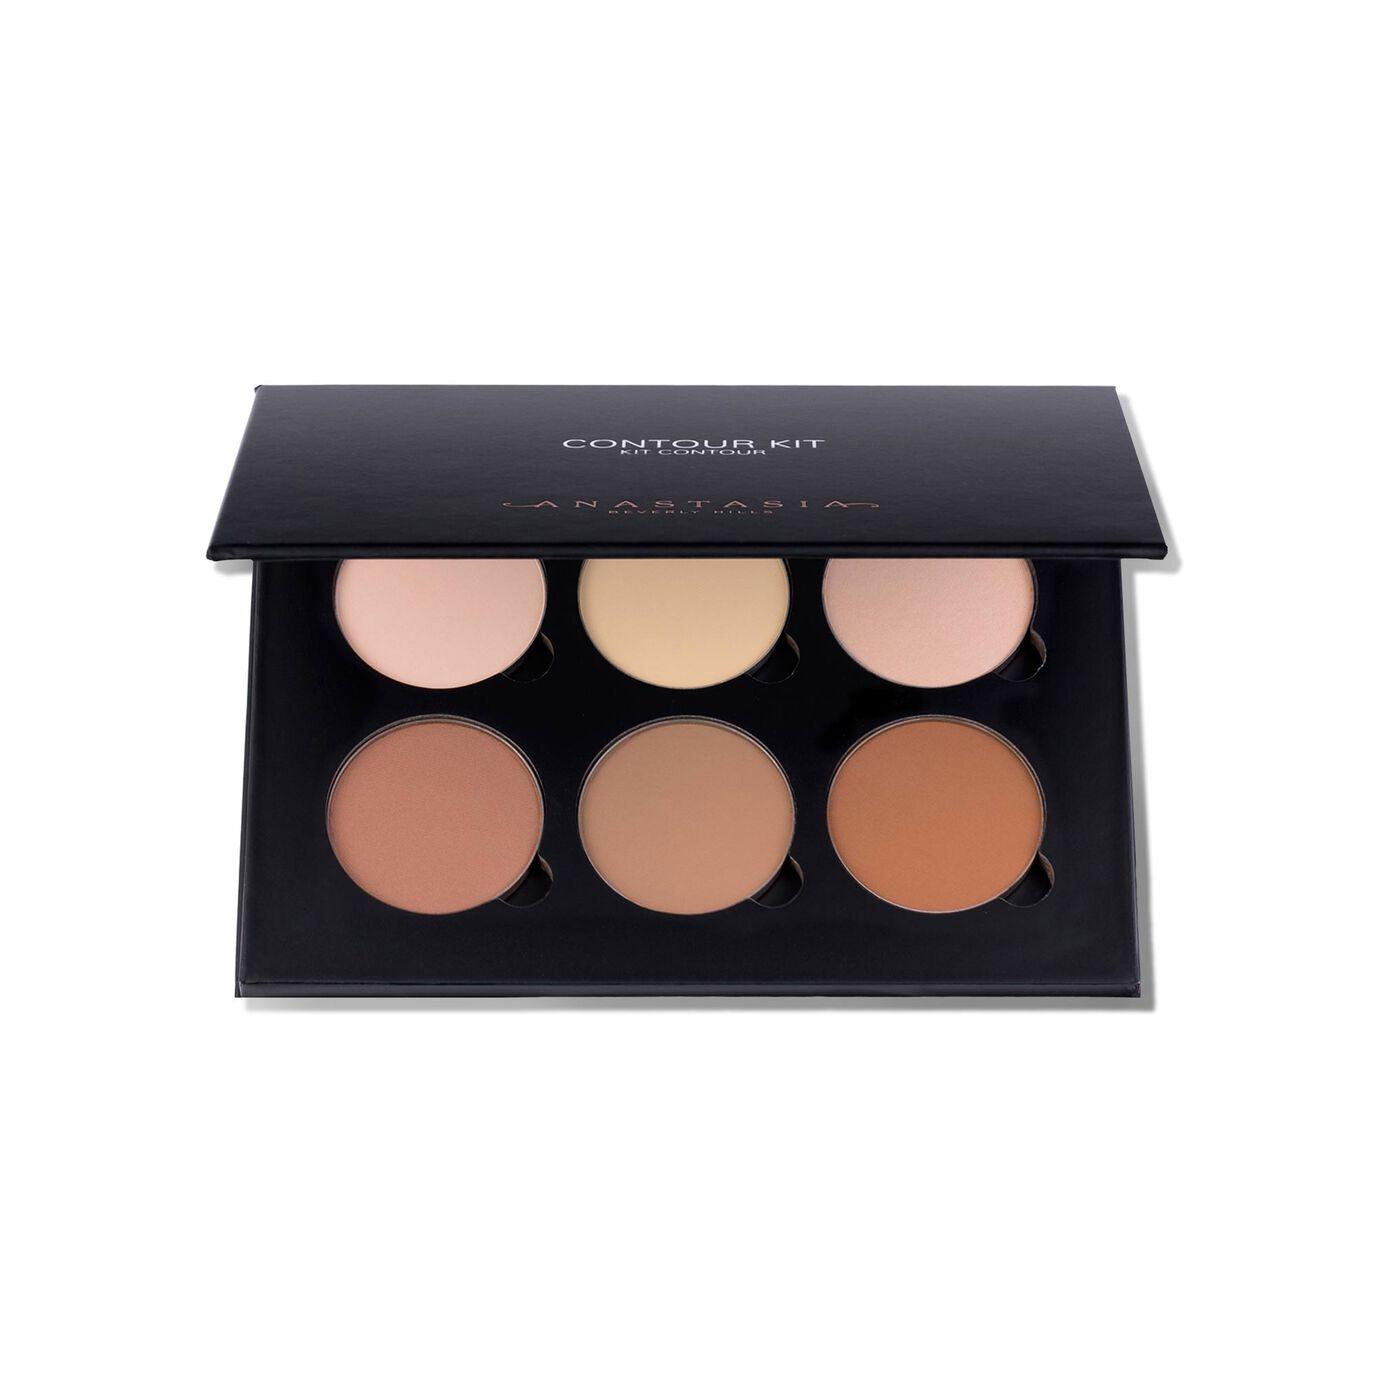 Anastasia Beverly Hills - Powder Contour Kit - Light to Medium